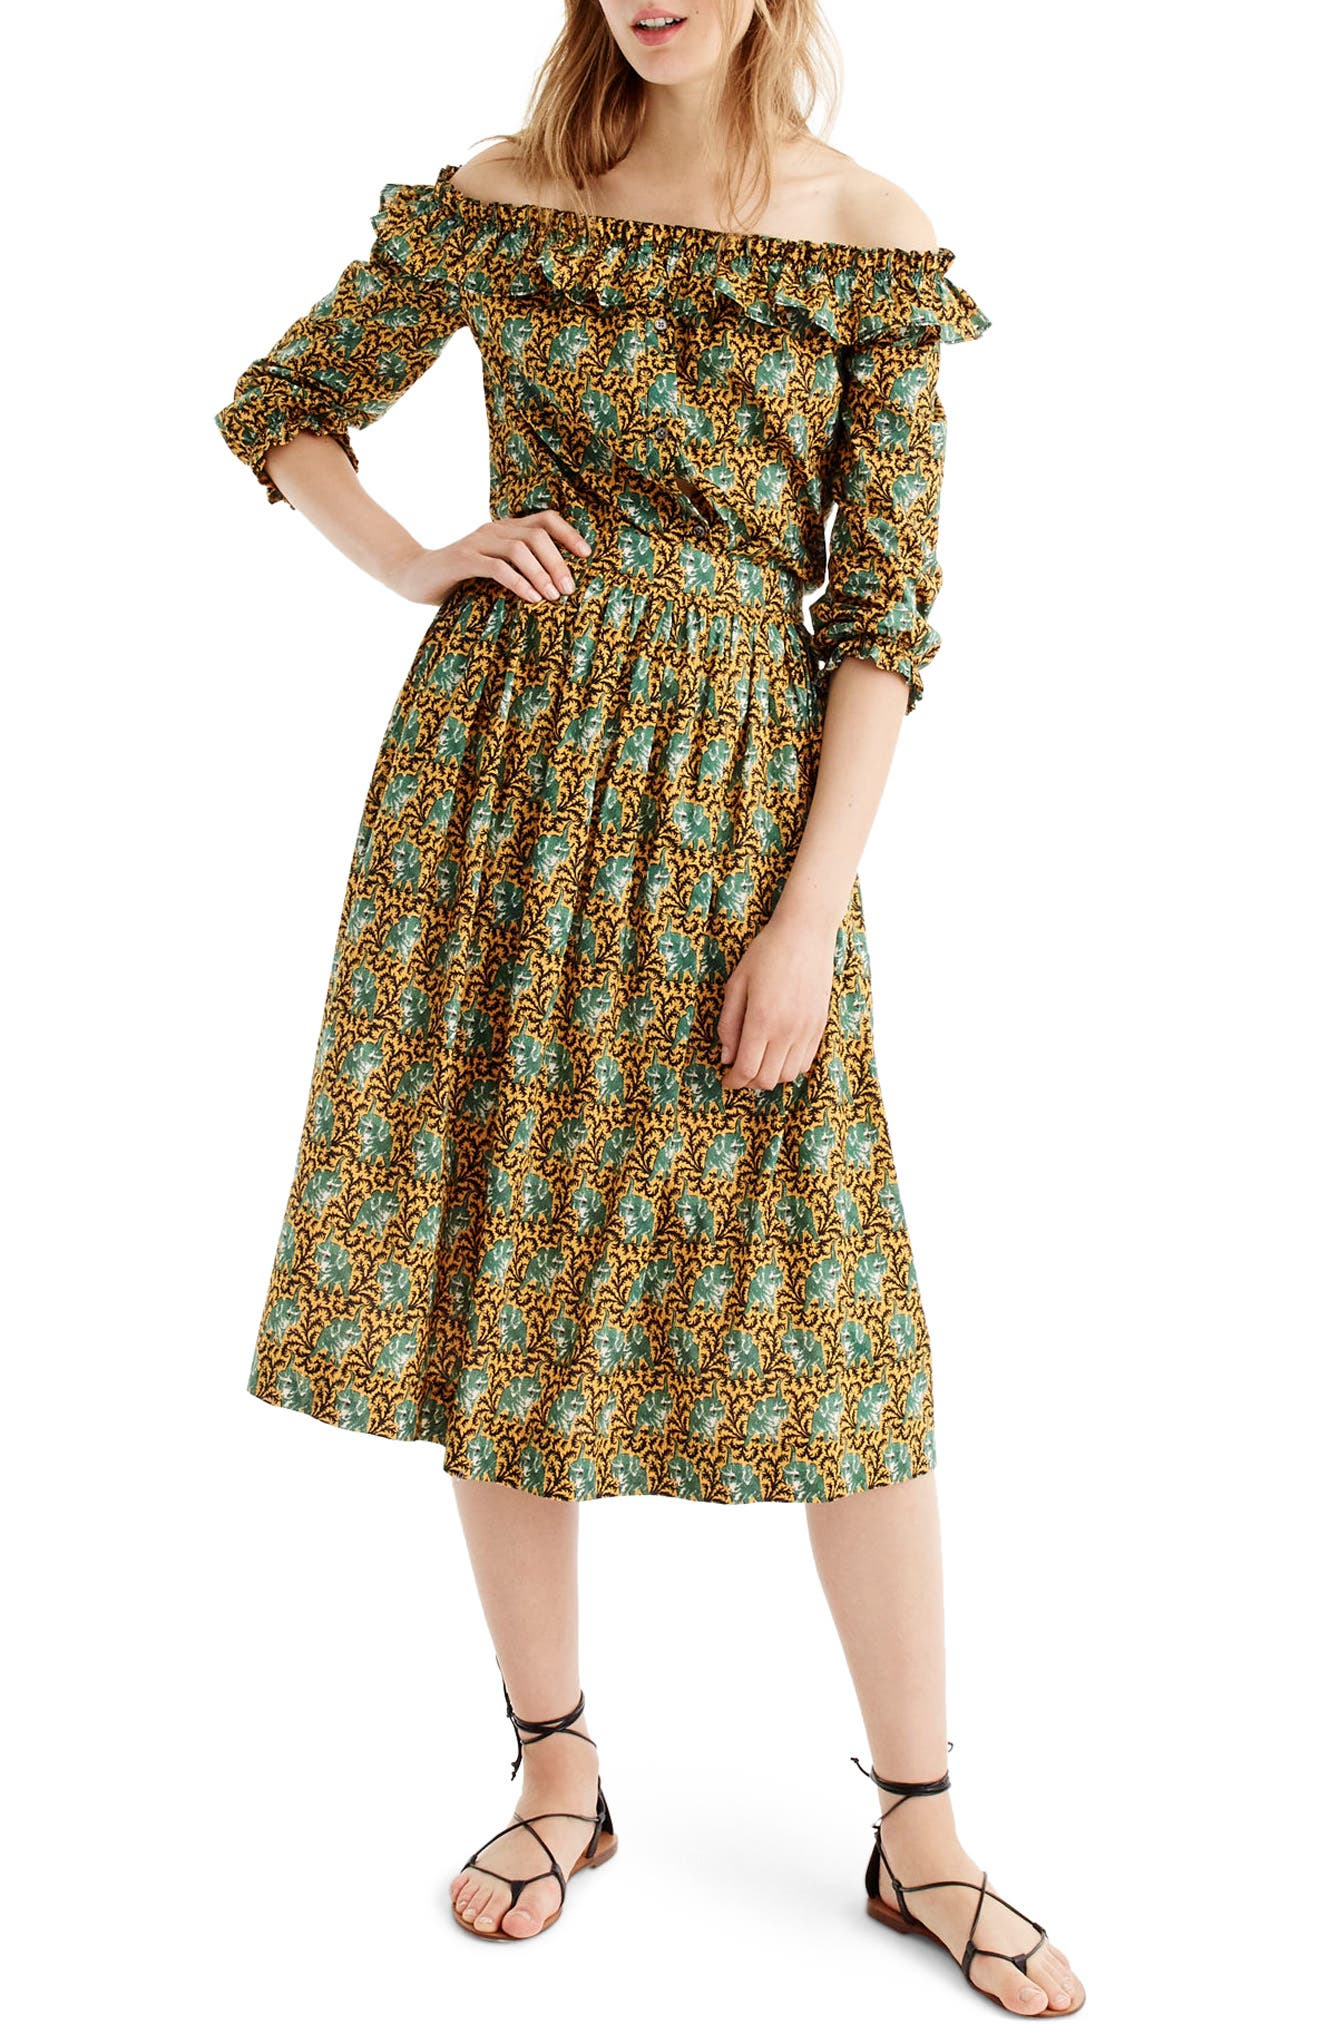 Elephant Print Skirt,                         Main,                         color,